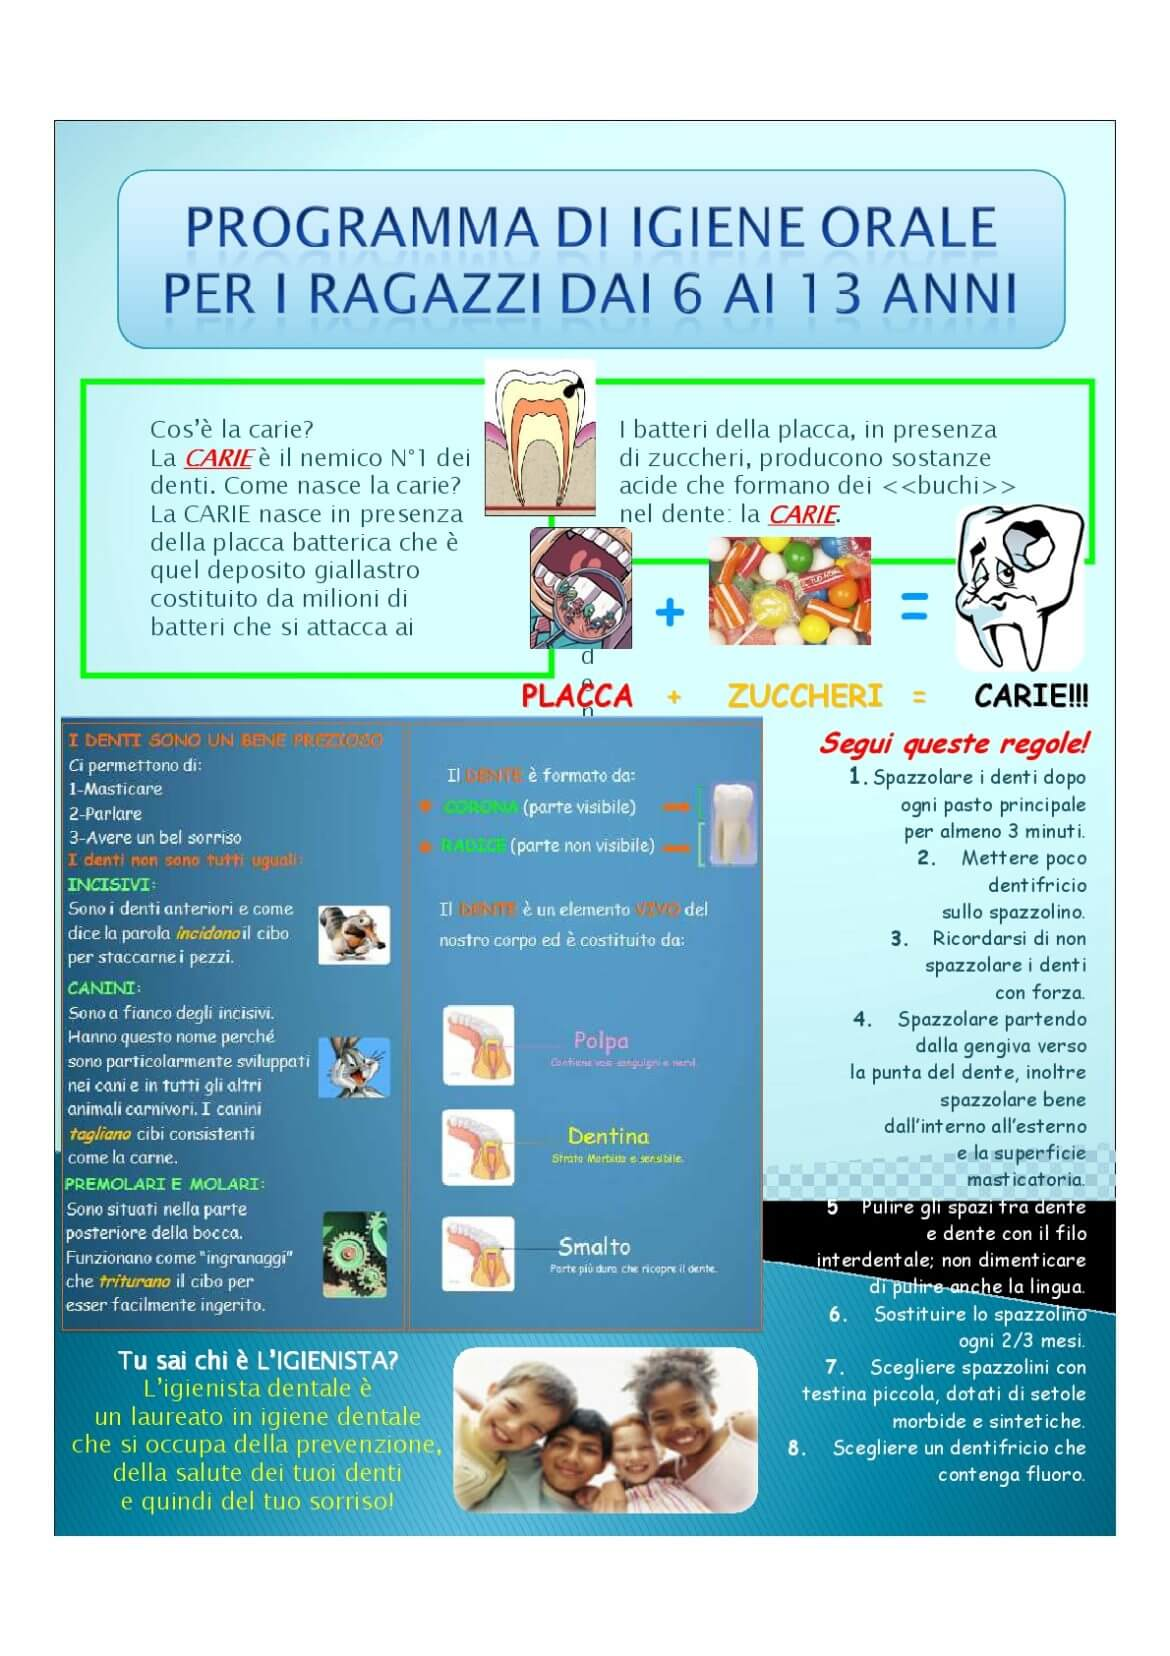 Poster-Igiene-Orale-001.jpg